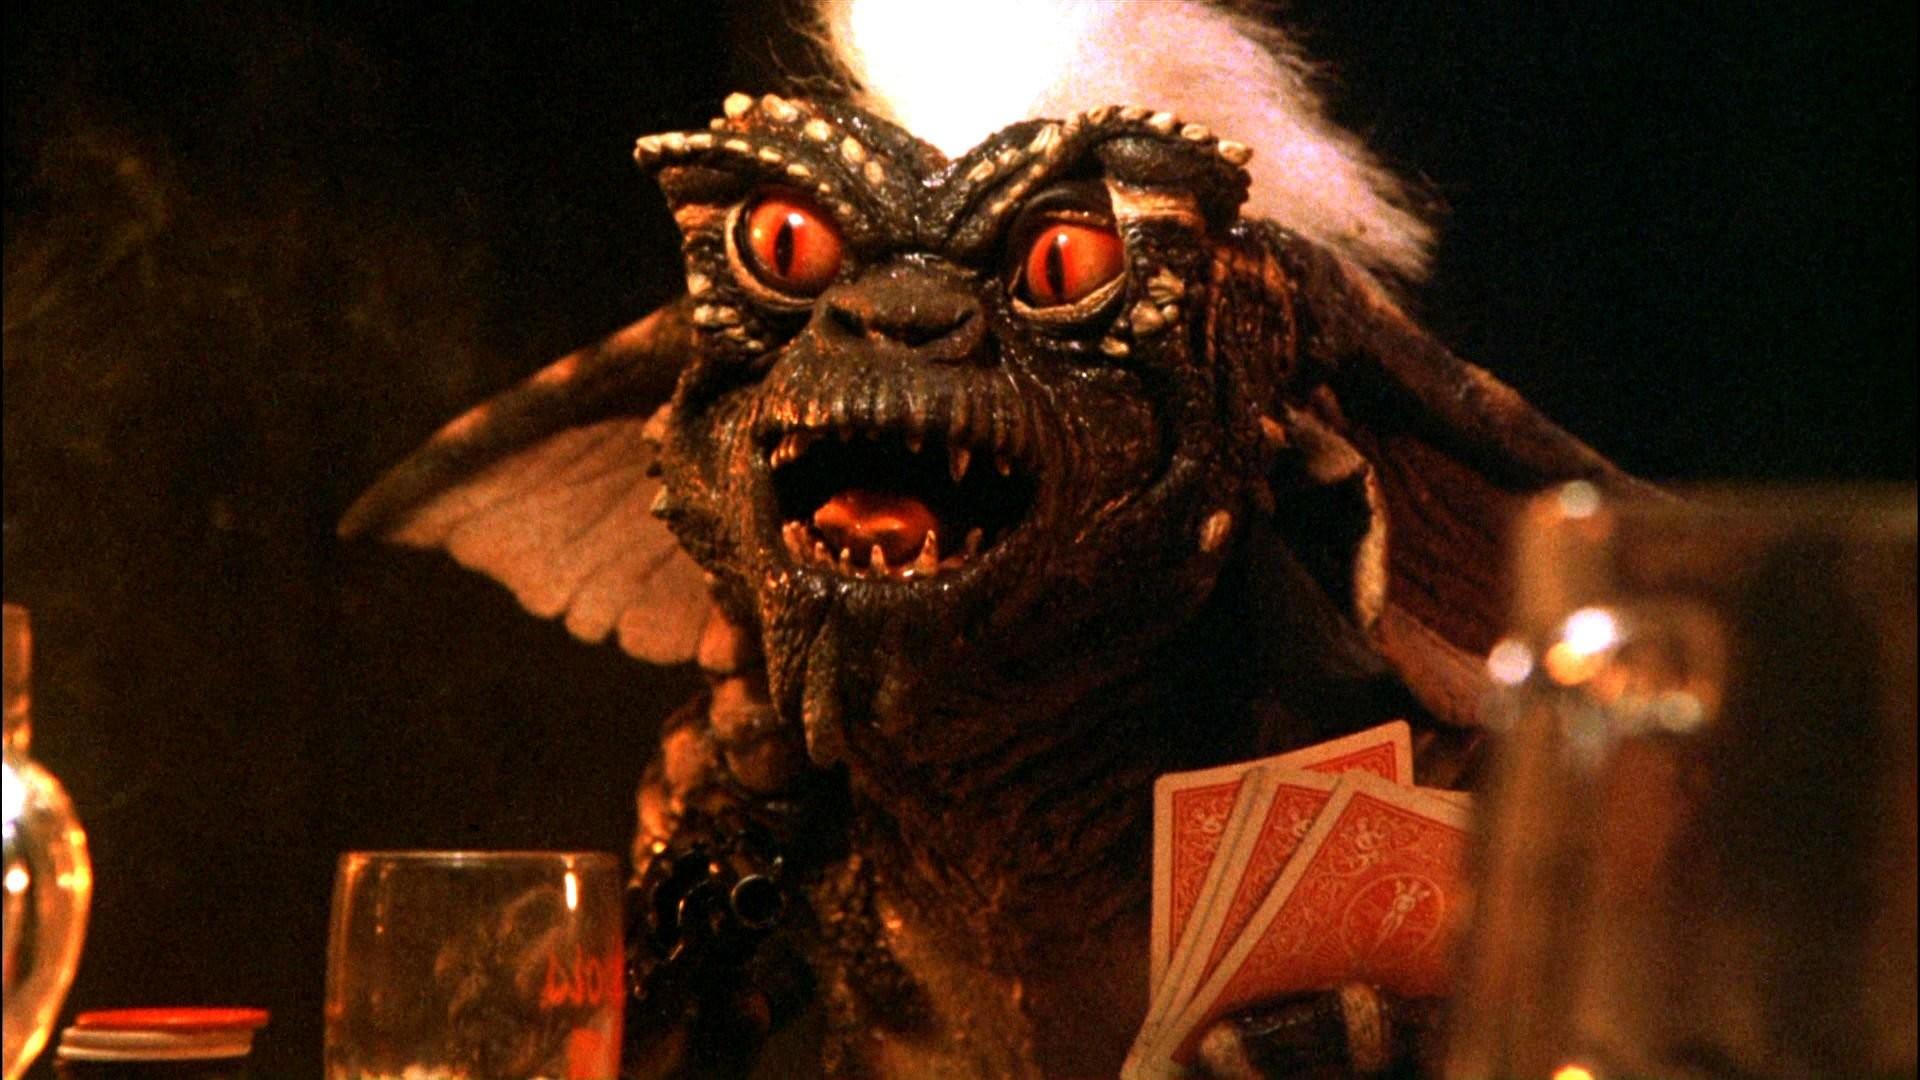 Res: 1920x1080, GREMLINS comedy horror creature monster alien (6) wallpaper |  |  252462 | WallpaperUP